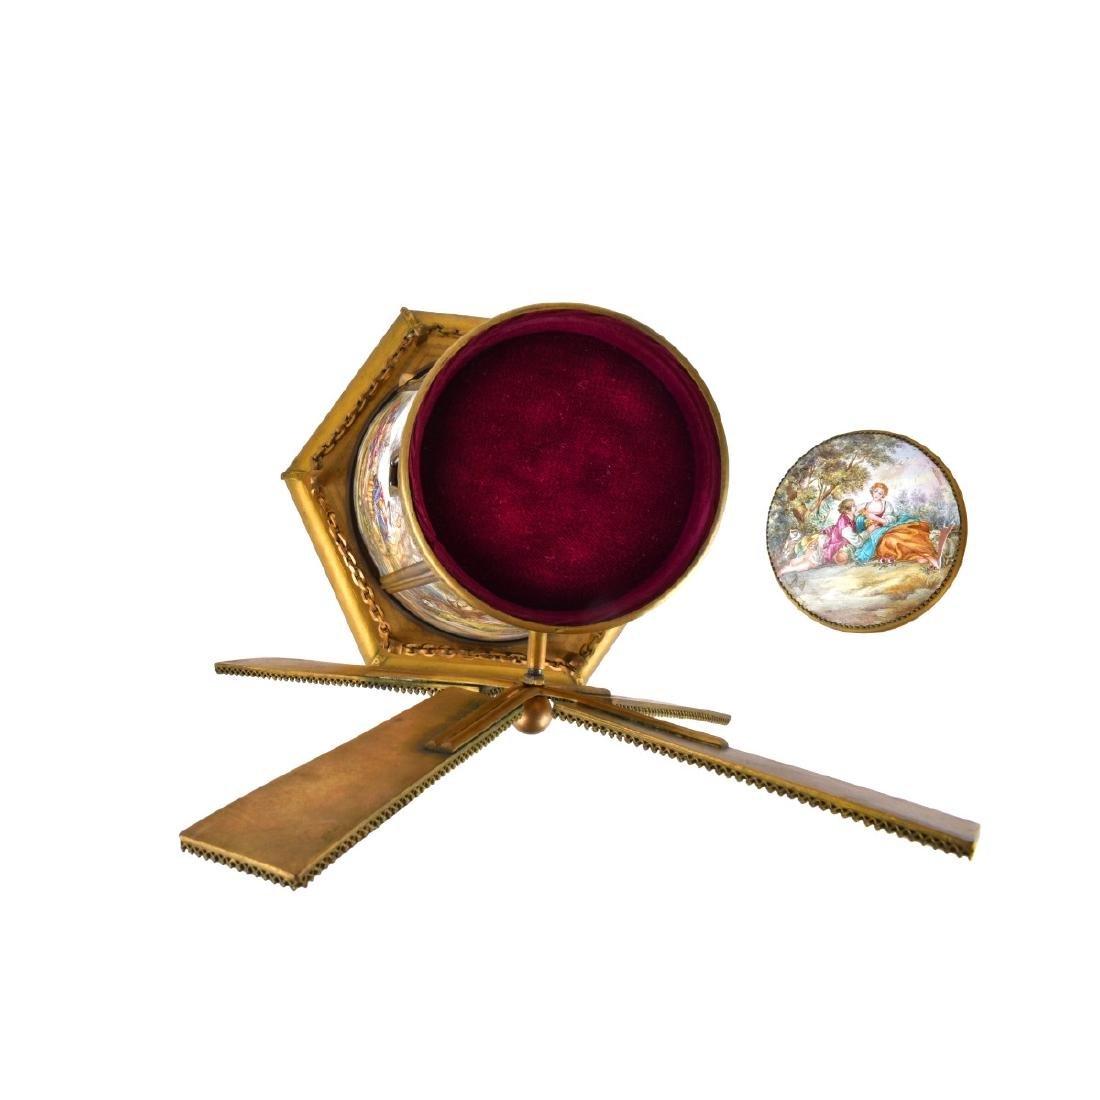 Austrian Bronze and Enamel Windmill Music Box. - 2